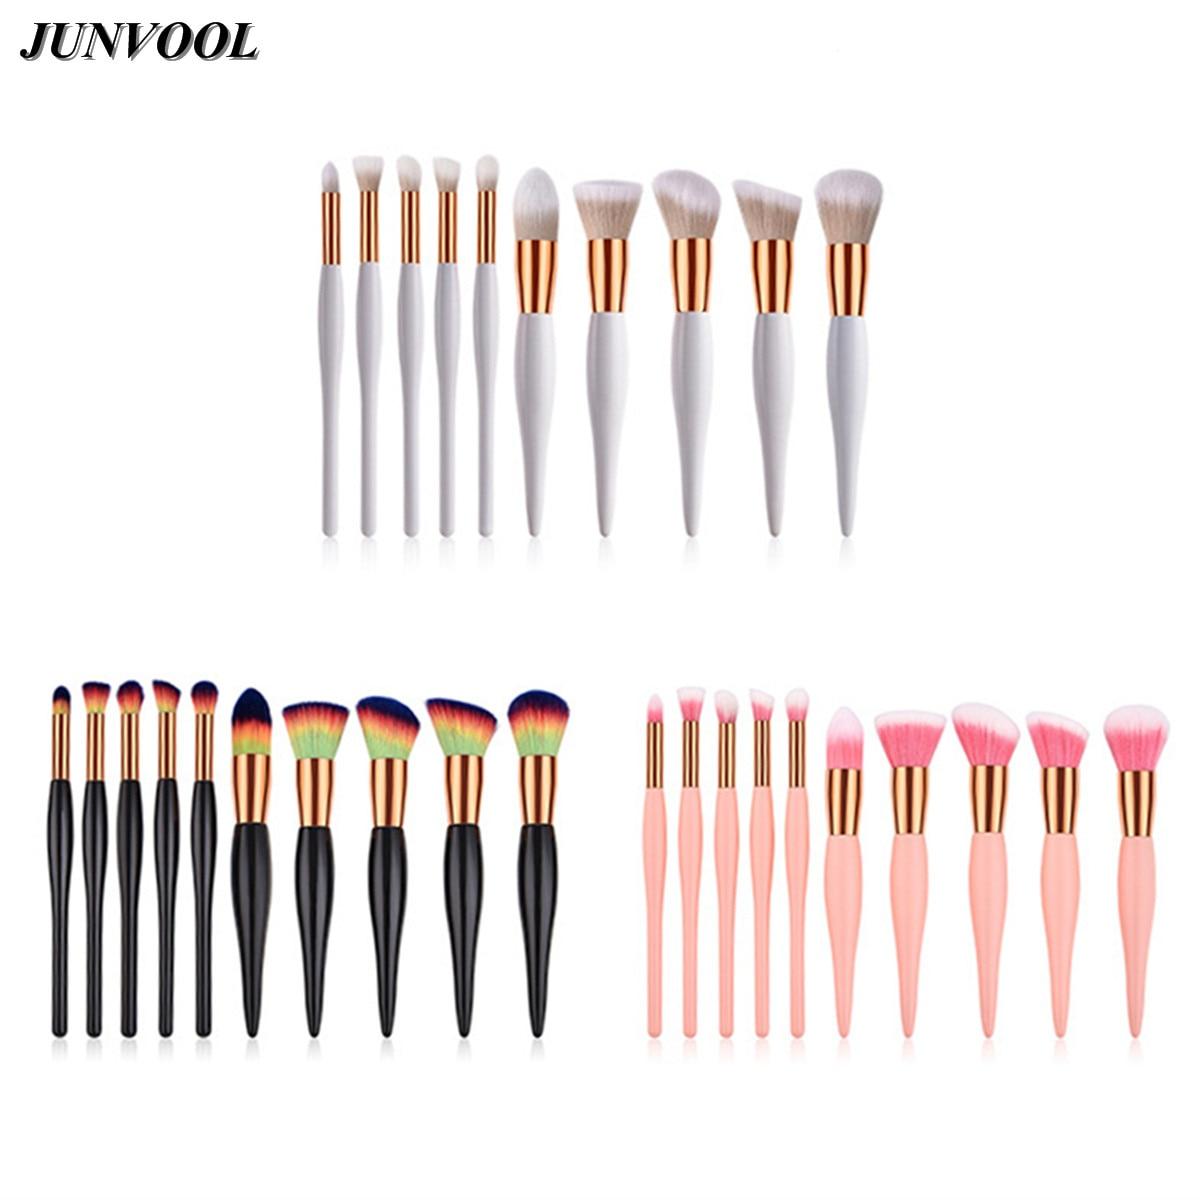 Superior Soft Cosmetic Make Up Brush Set 10pcs Woman's Toiletry Kit Beauty Makeup Brushes Newest Kabuki Flame Powder Blush Brush